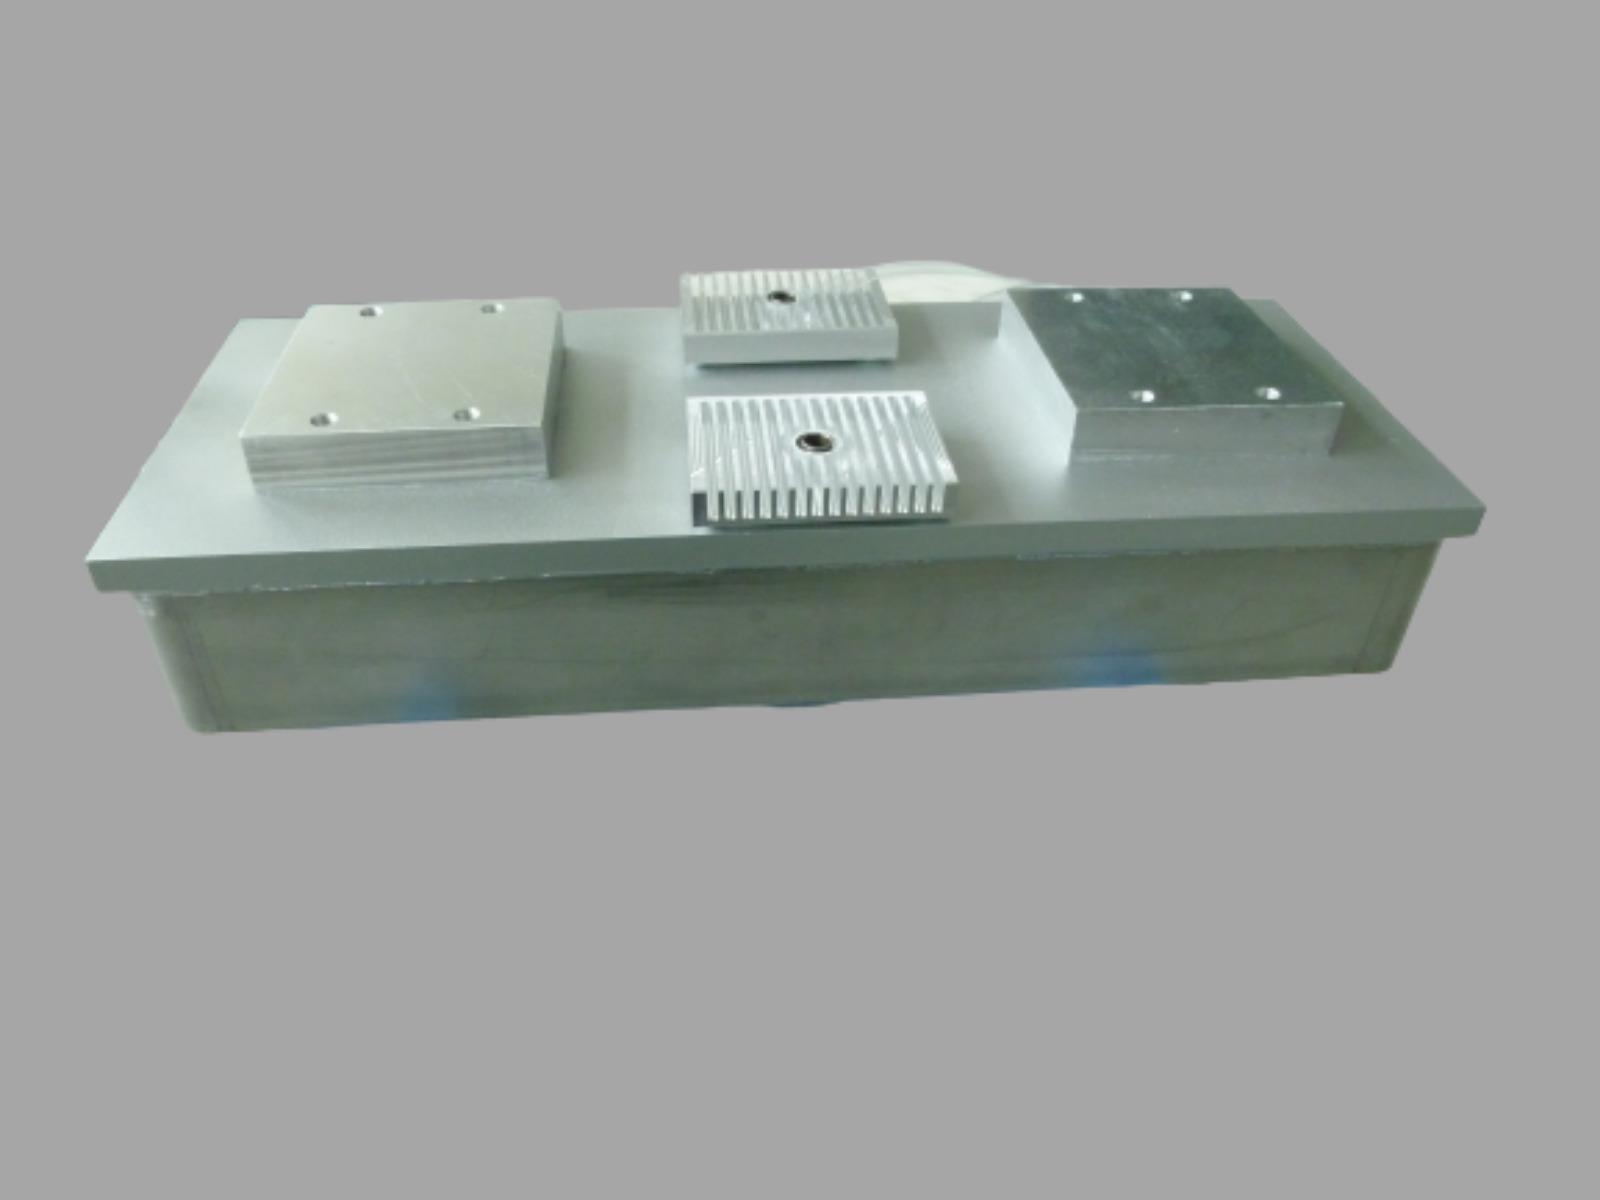 Flat cryostat